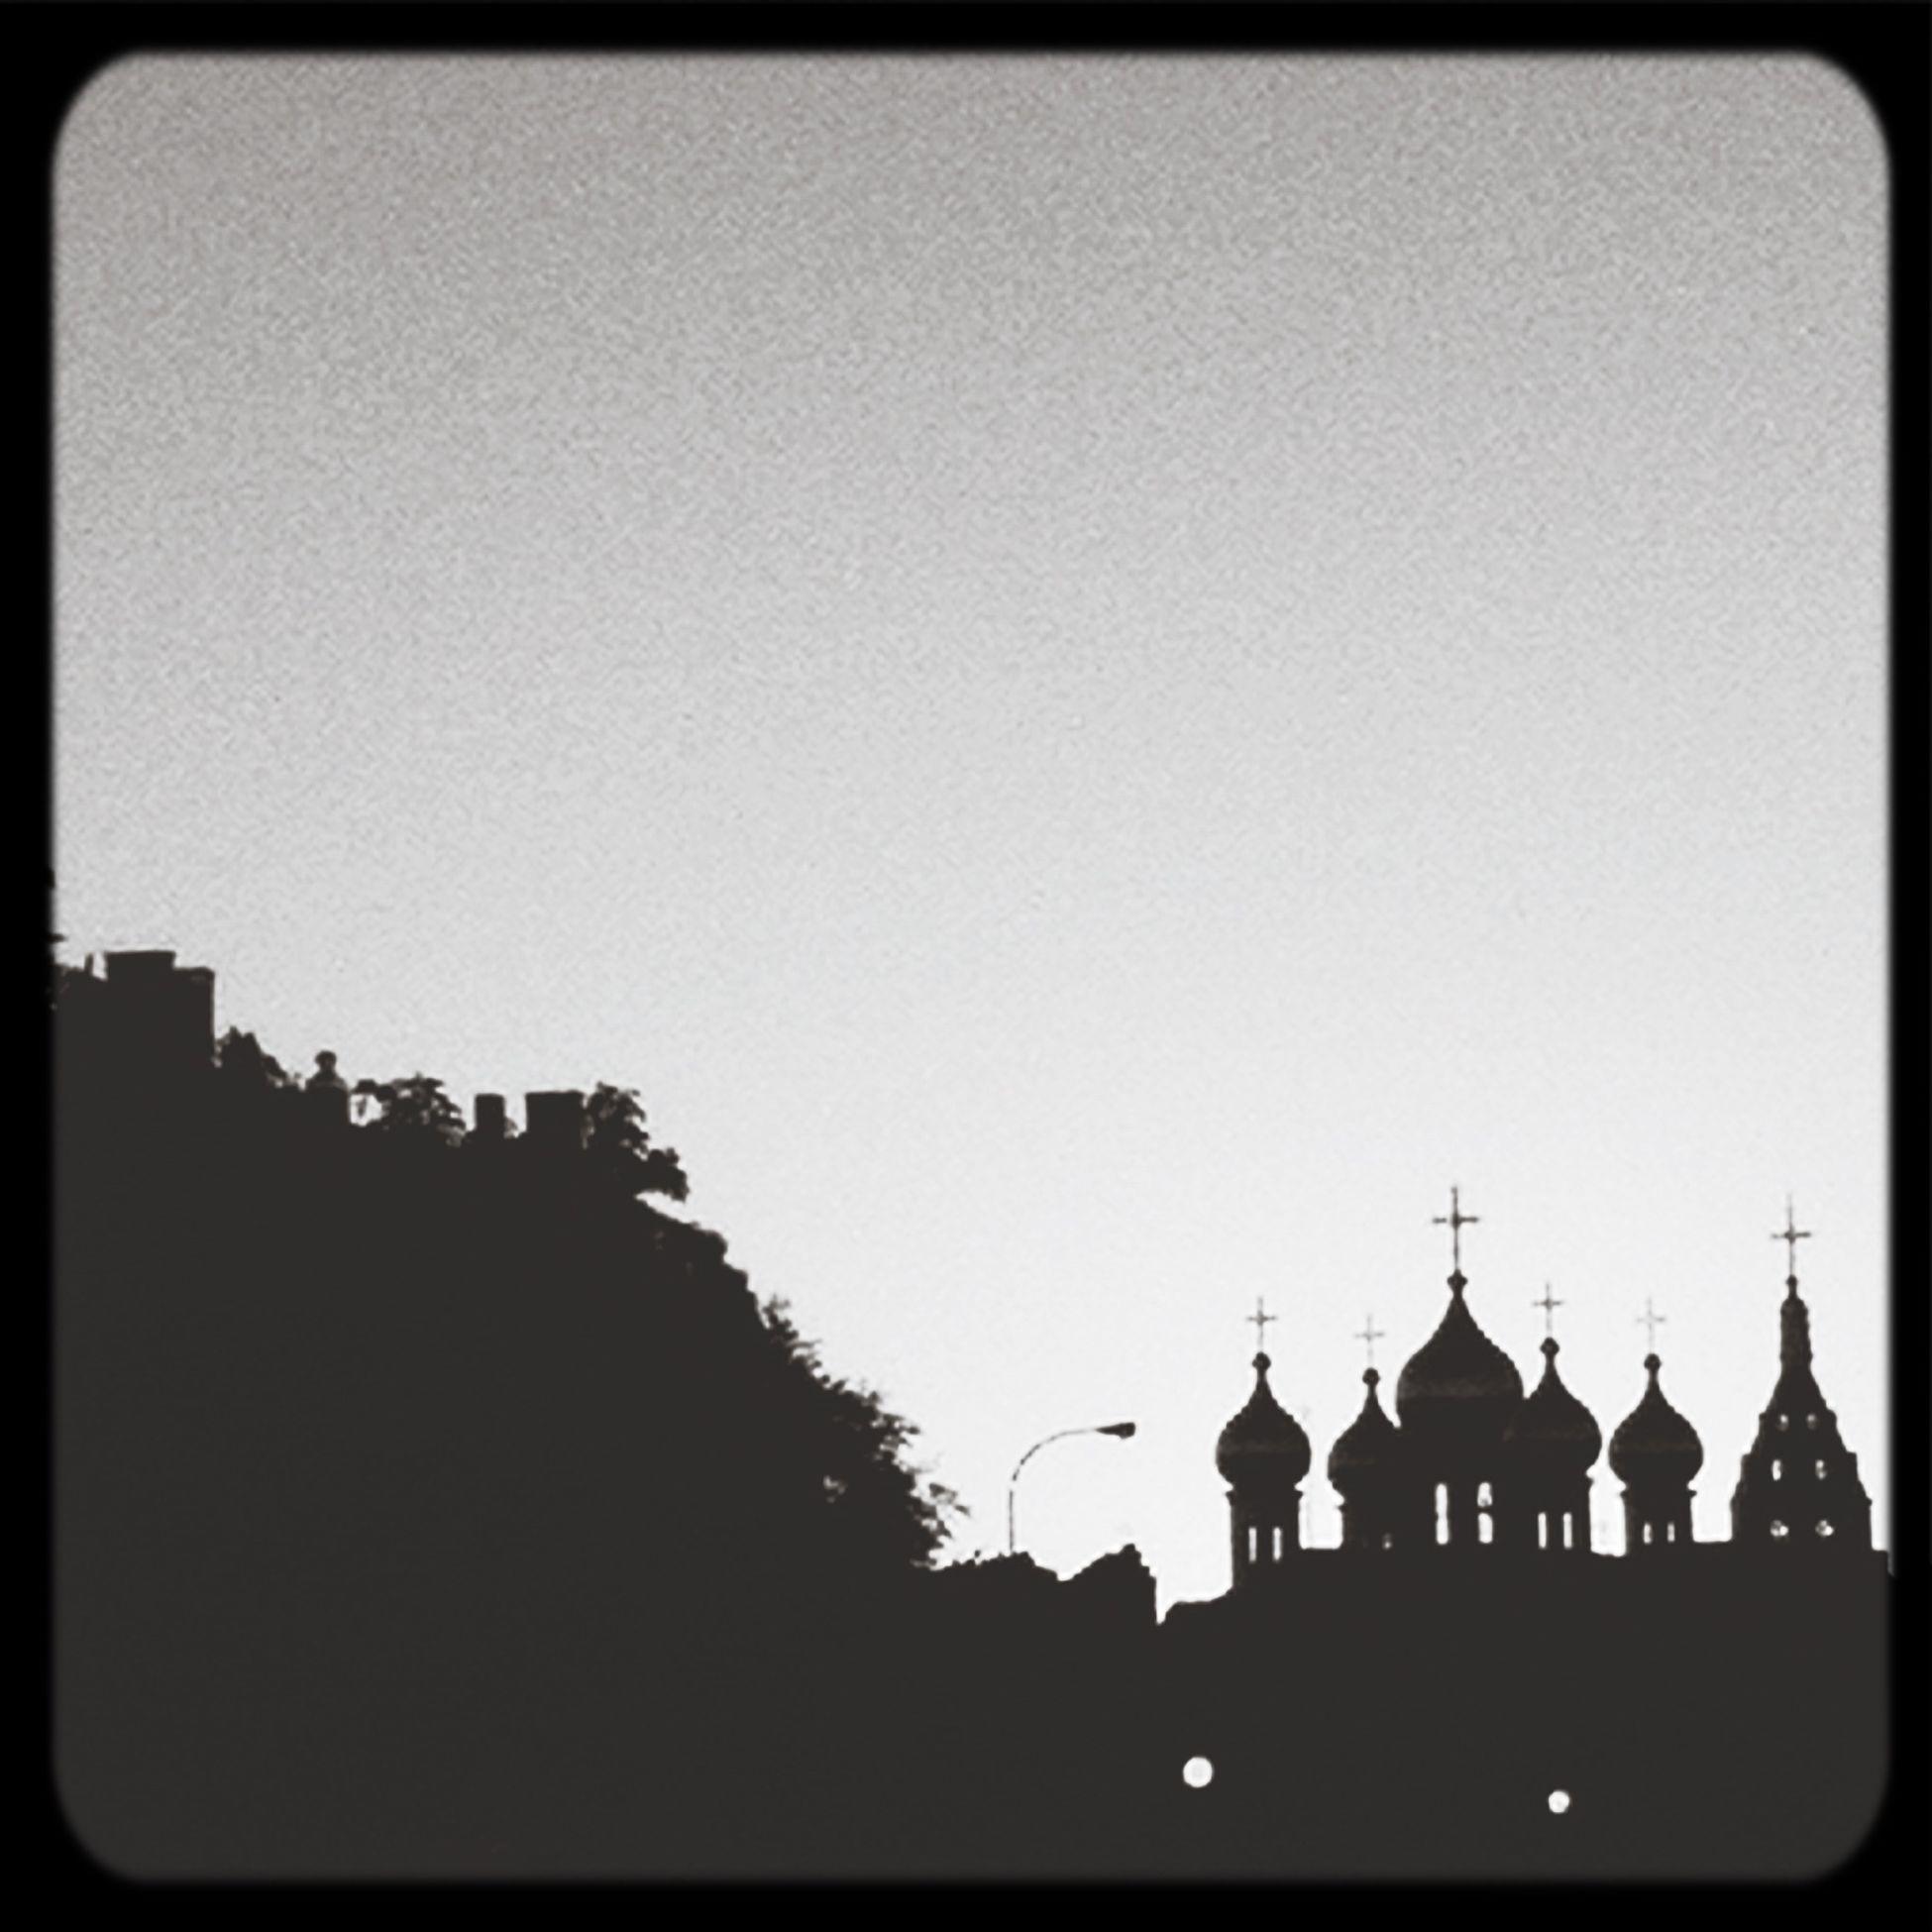 Silhouette Arquitecture Madrid Blackandwhite